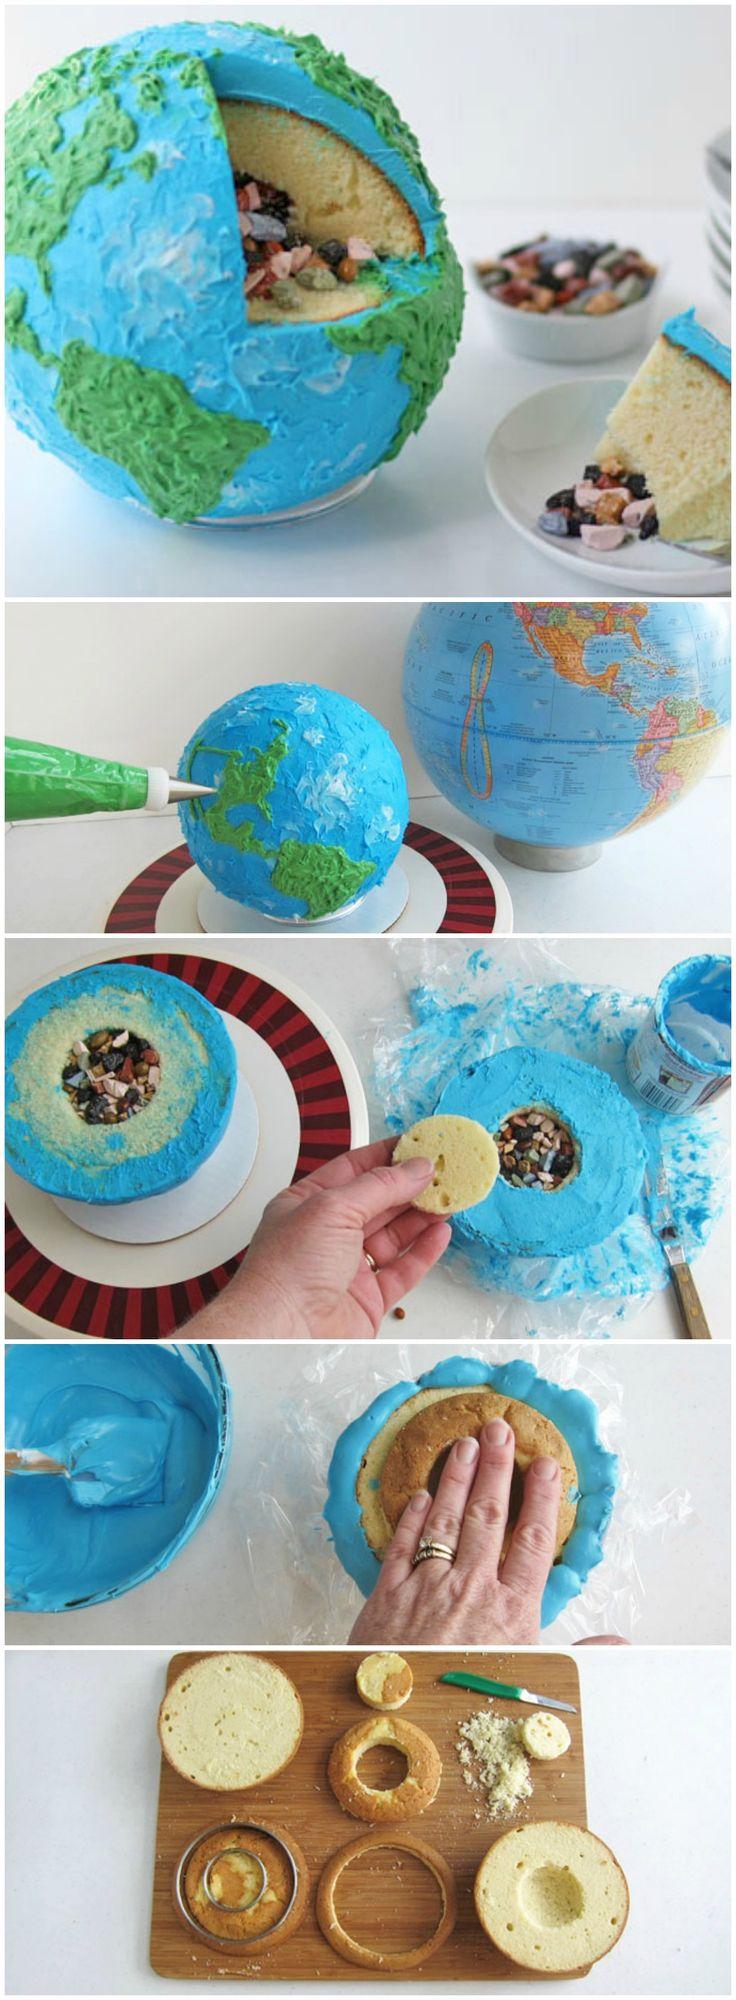 Earth Cake w/ Rock Candy Core #EarthDay